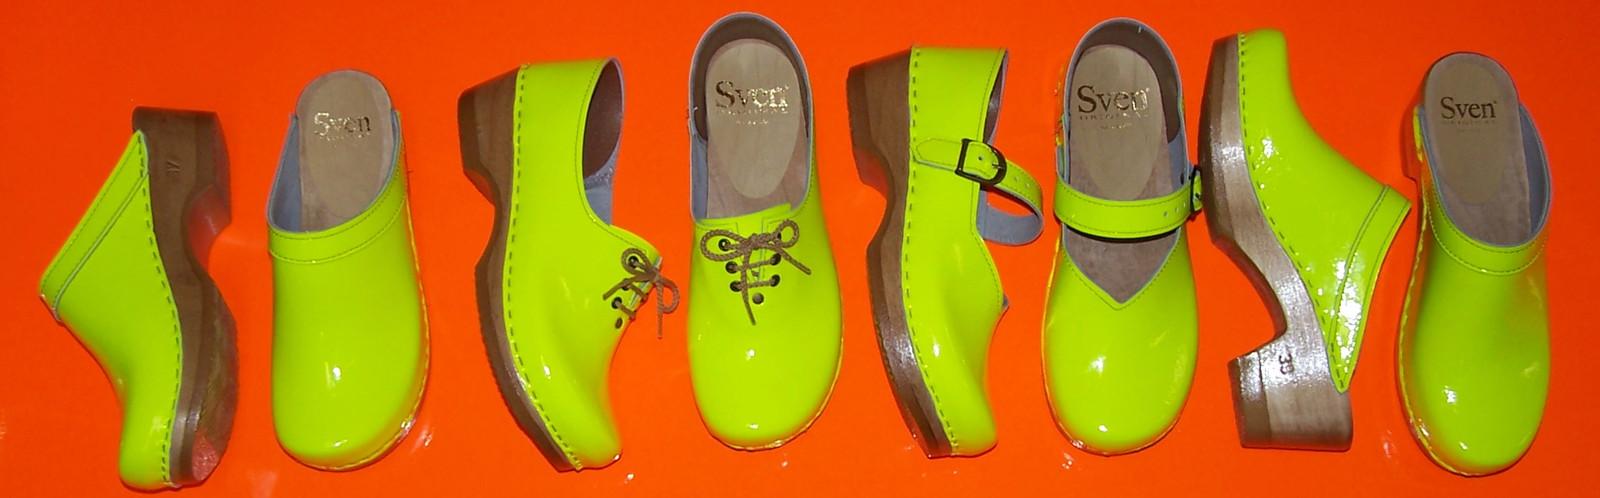 Neon Orange - Plain Clogs - Low Heels